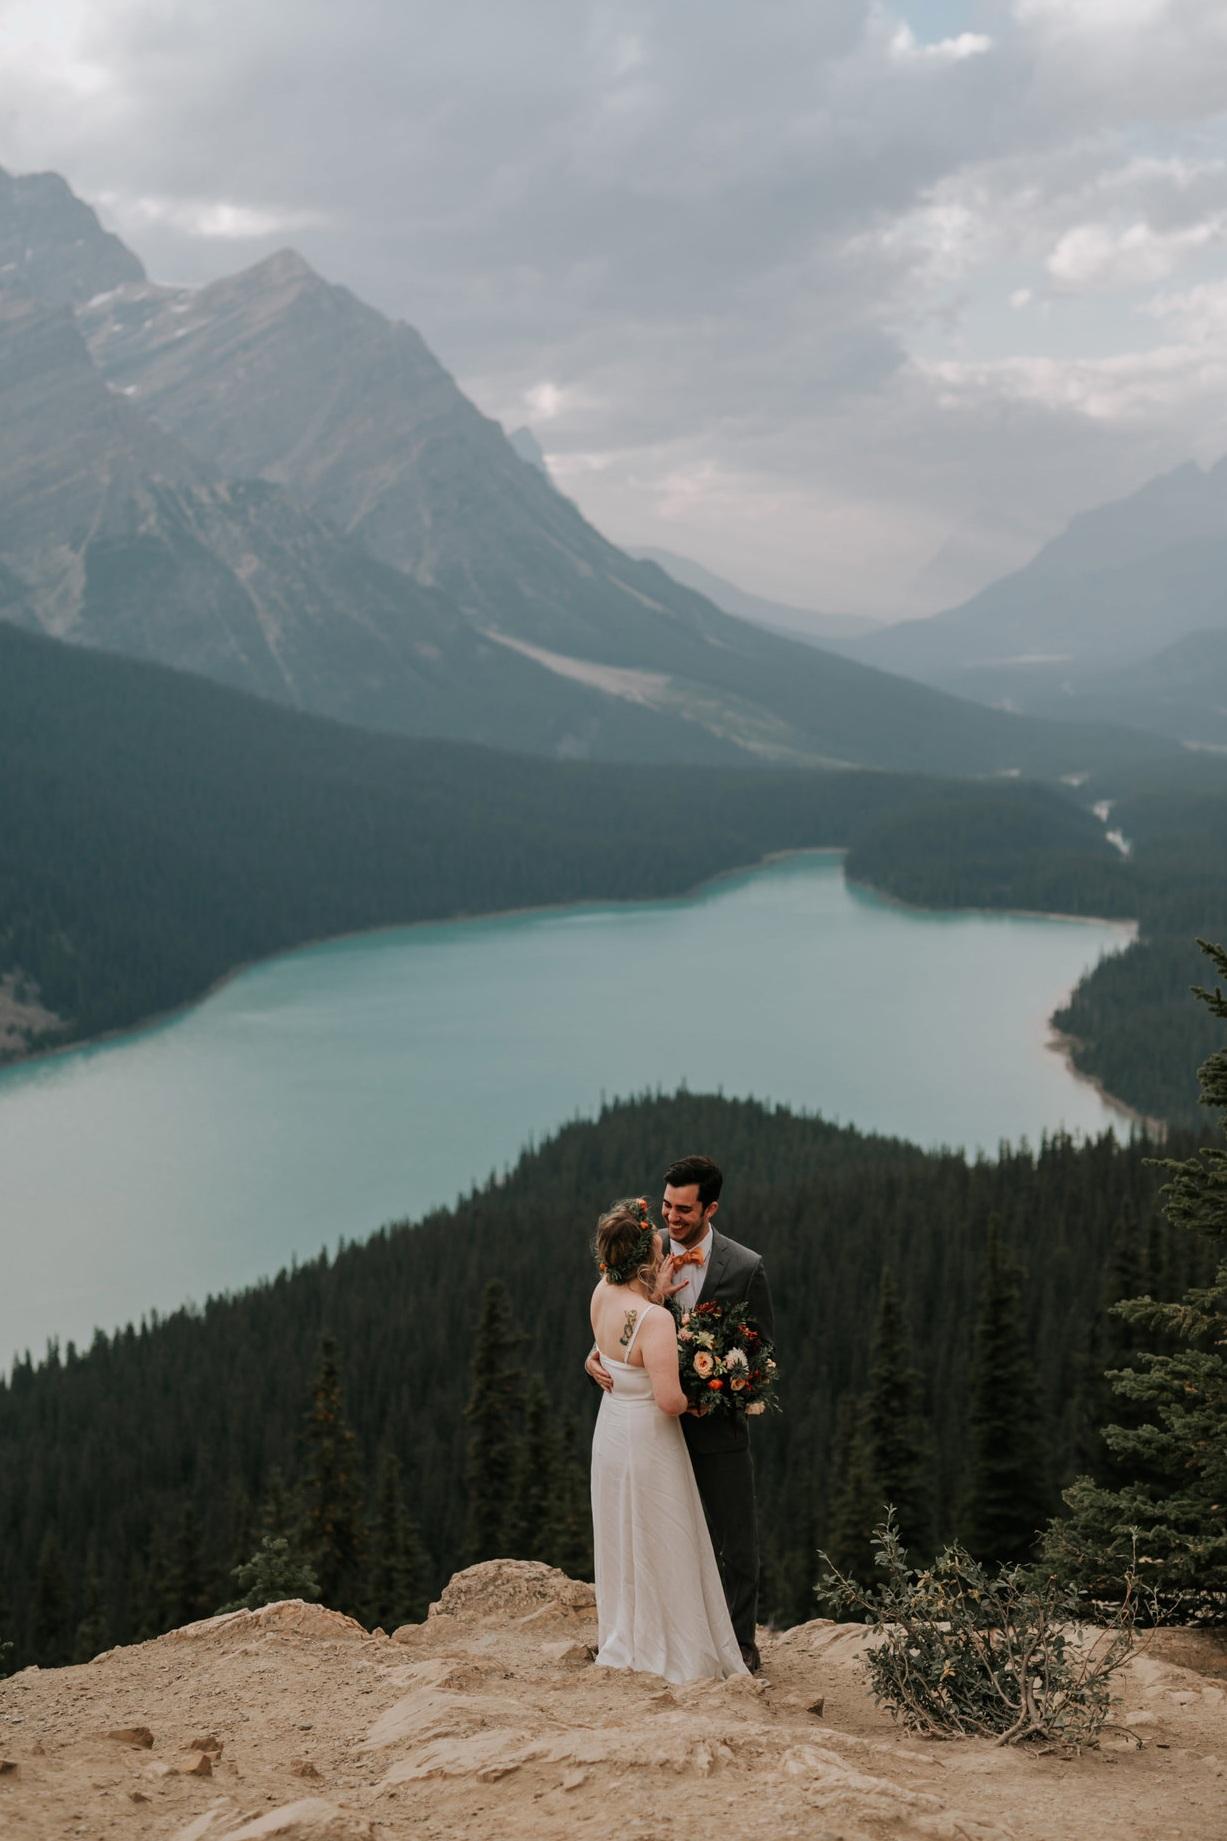 Banff National Park, Alberta Canada Elopement - Grace and Jaden Photography (14).jpg